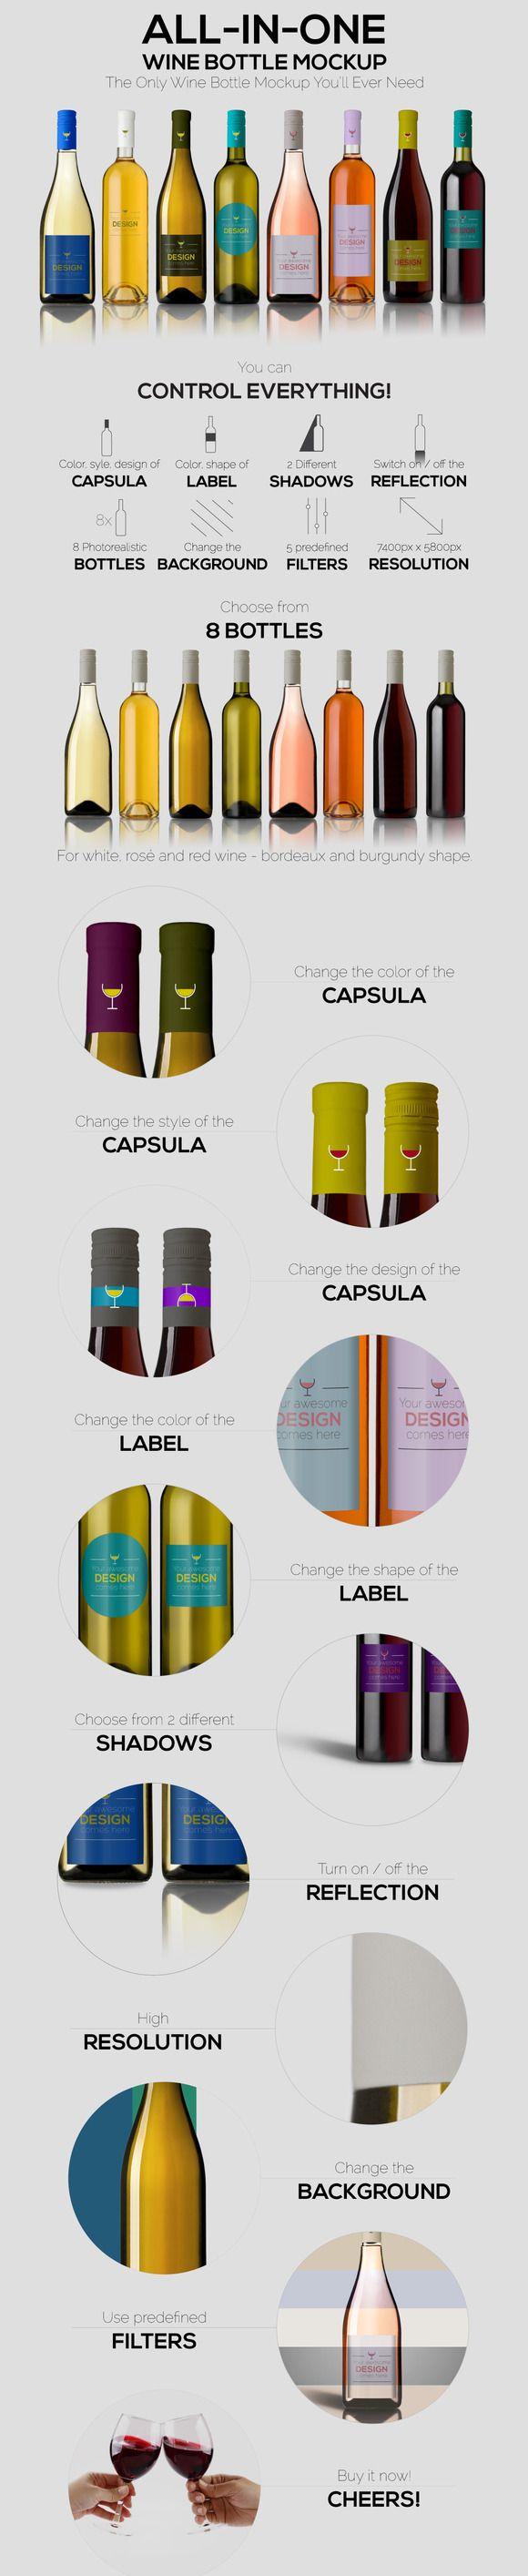 All-In-One Wine Bottle Mockup by zsoltczigler on @creativemarket